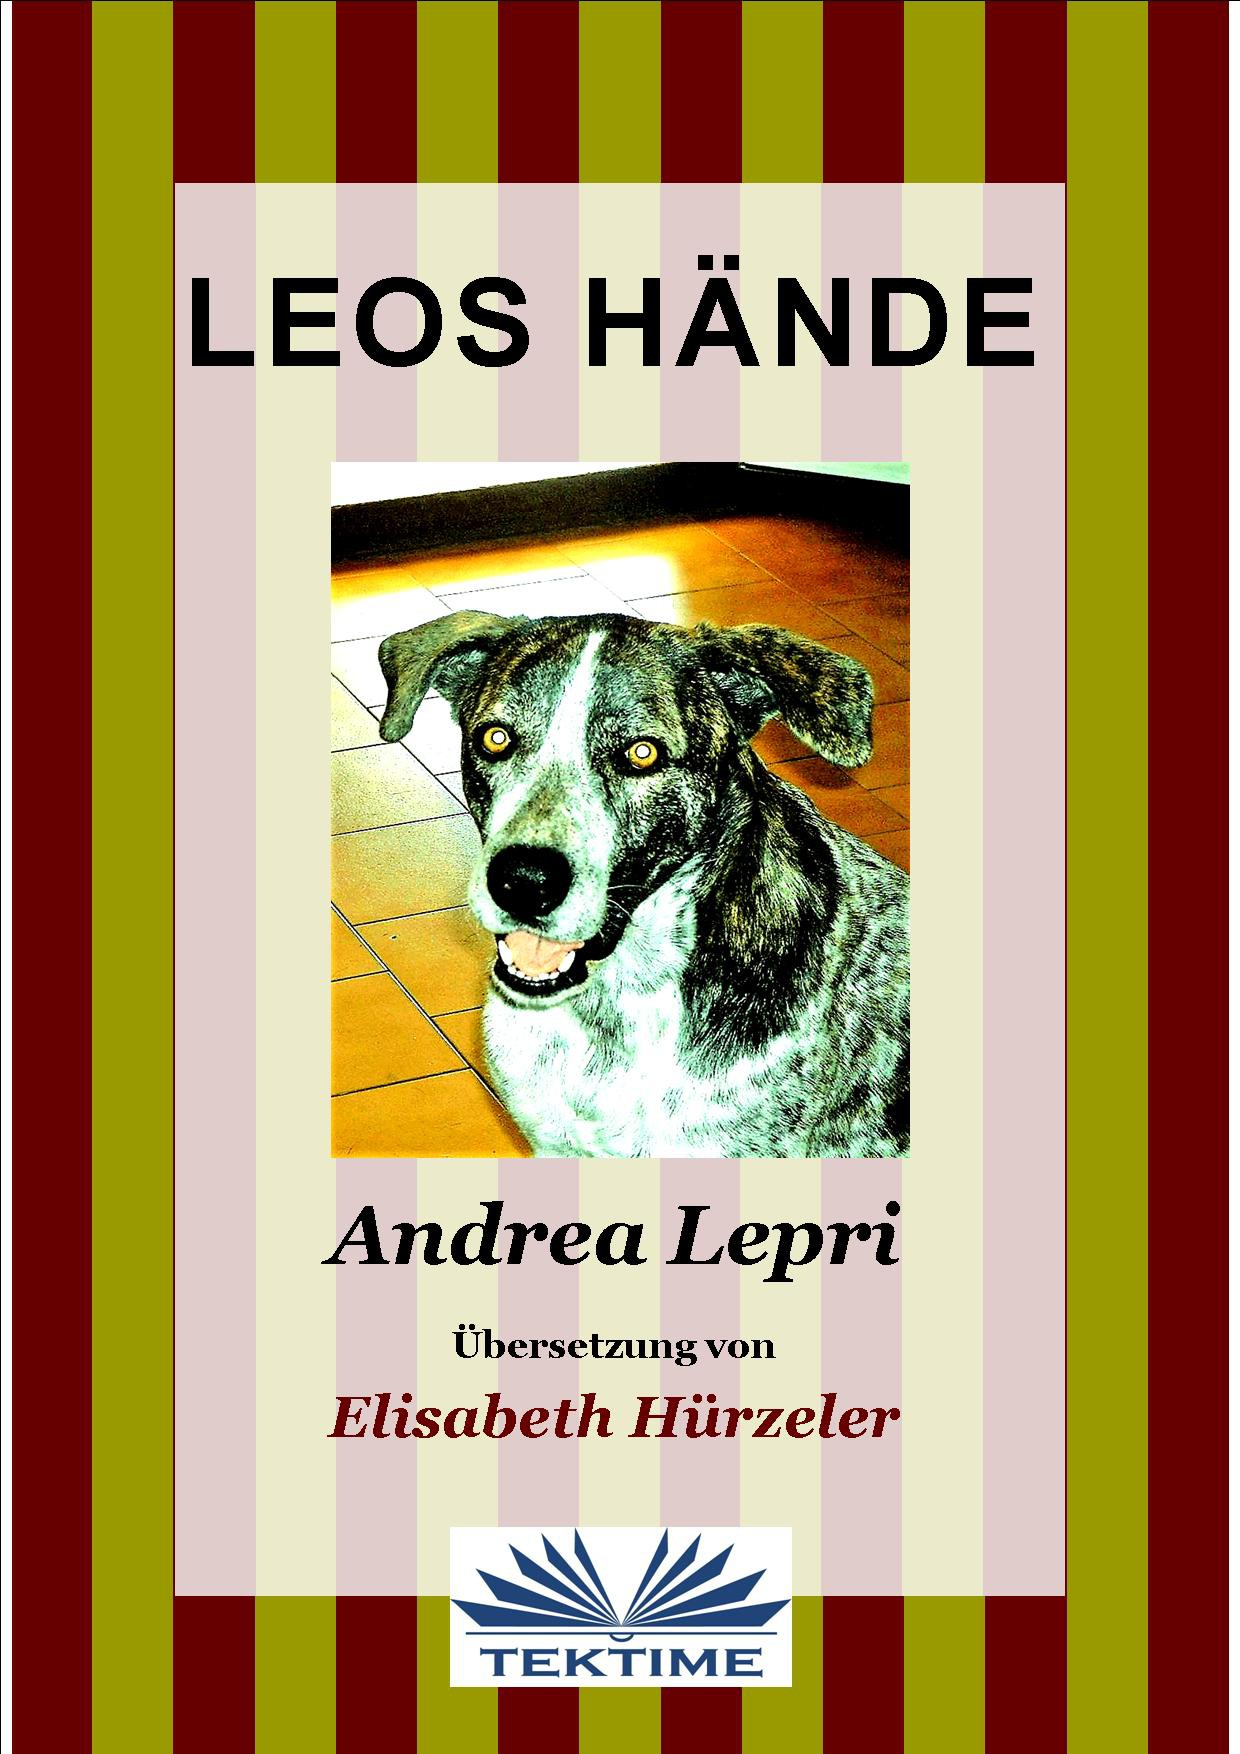 Leos Hände